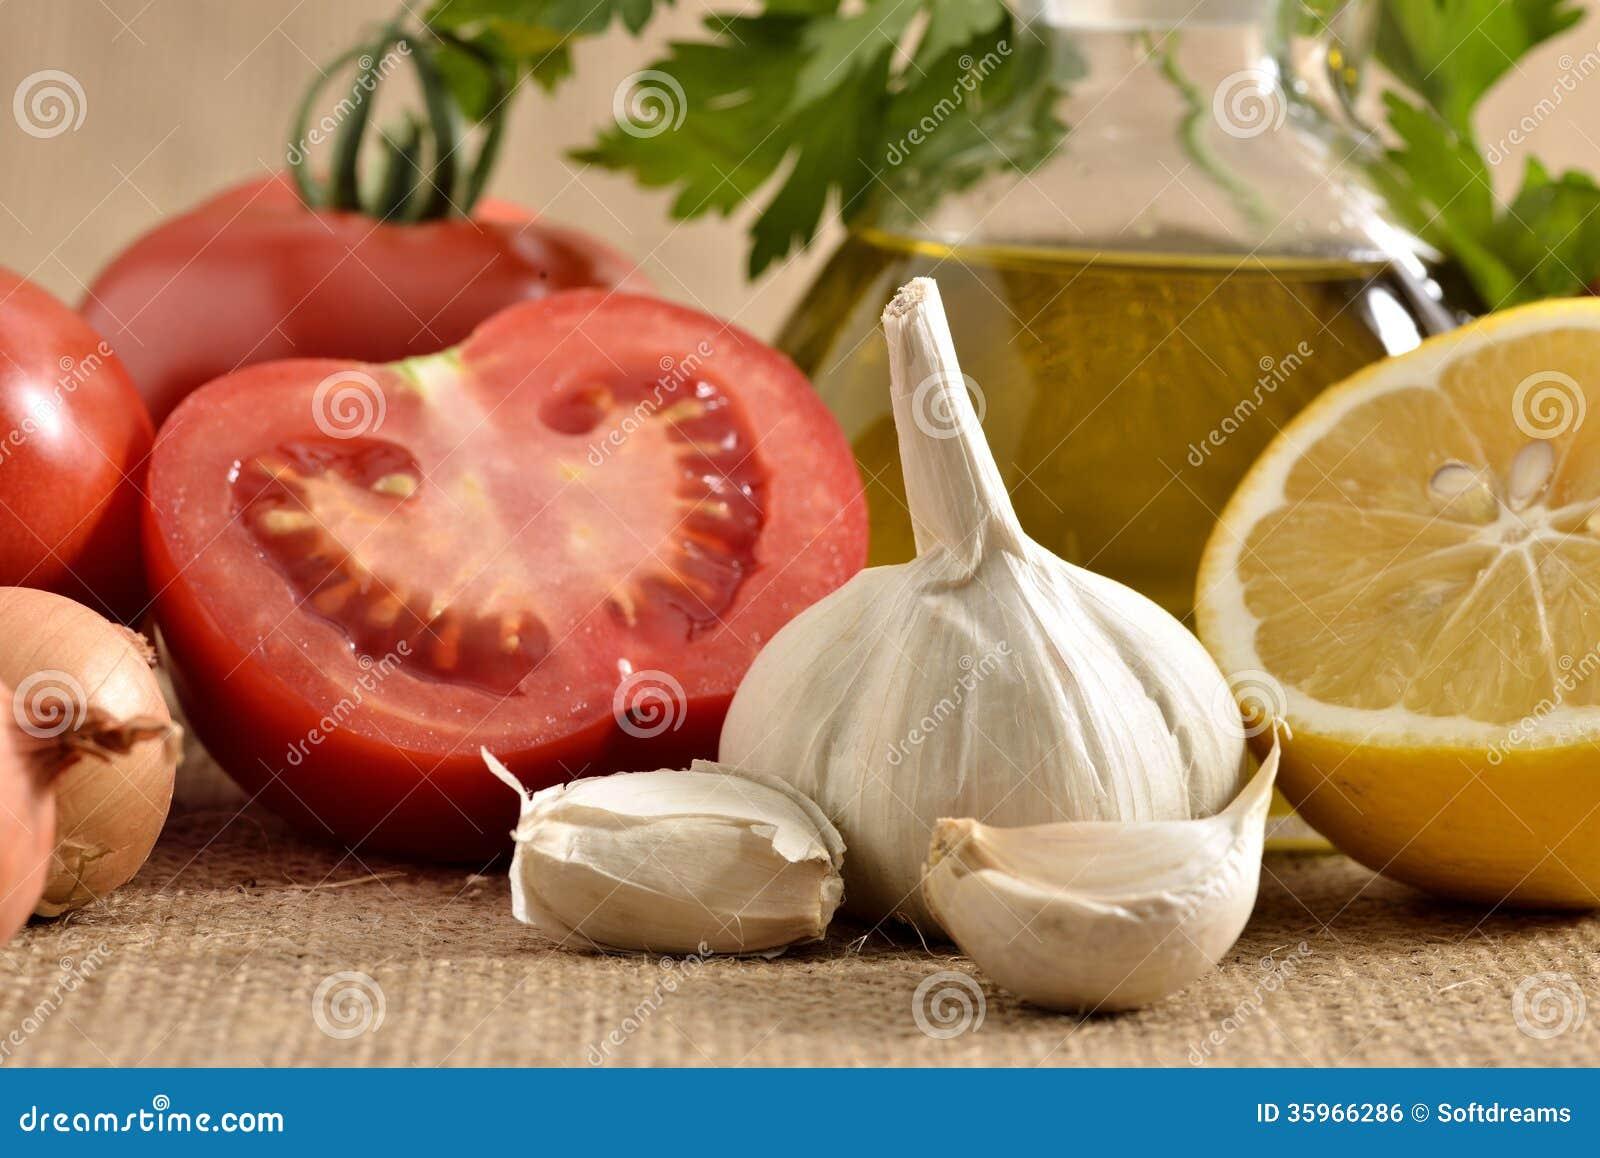 Tomates cebolla, ajo, pimienta, tomates